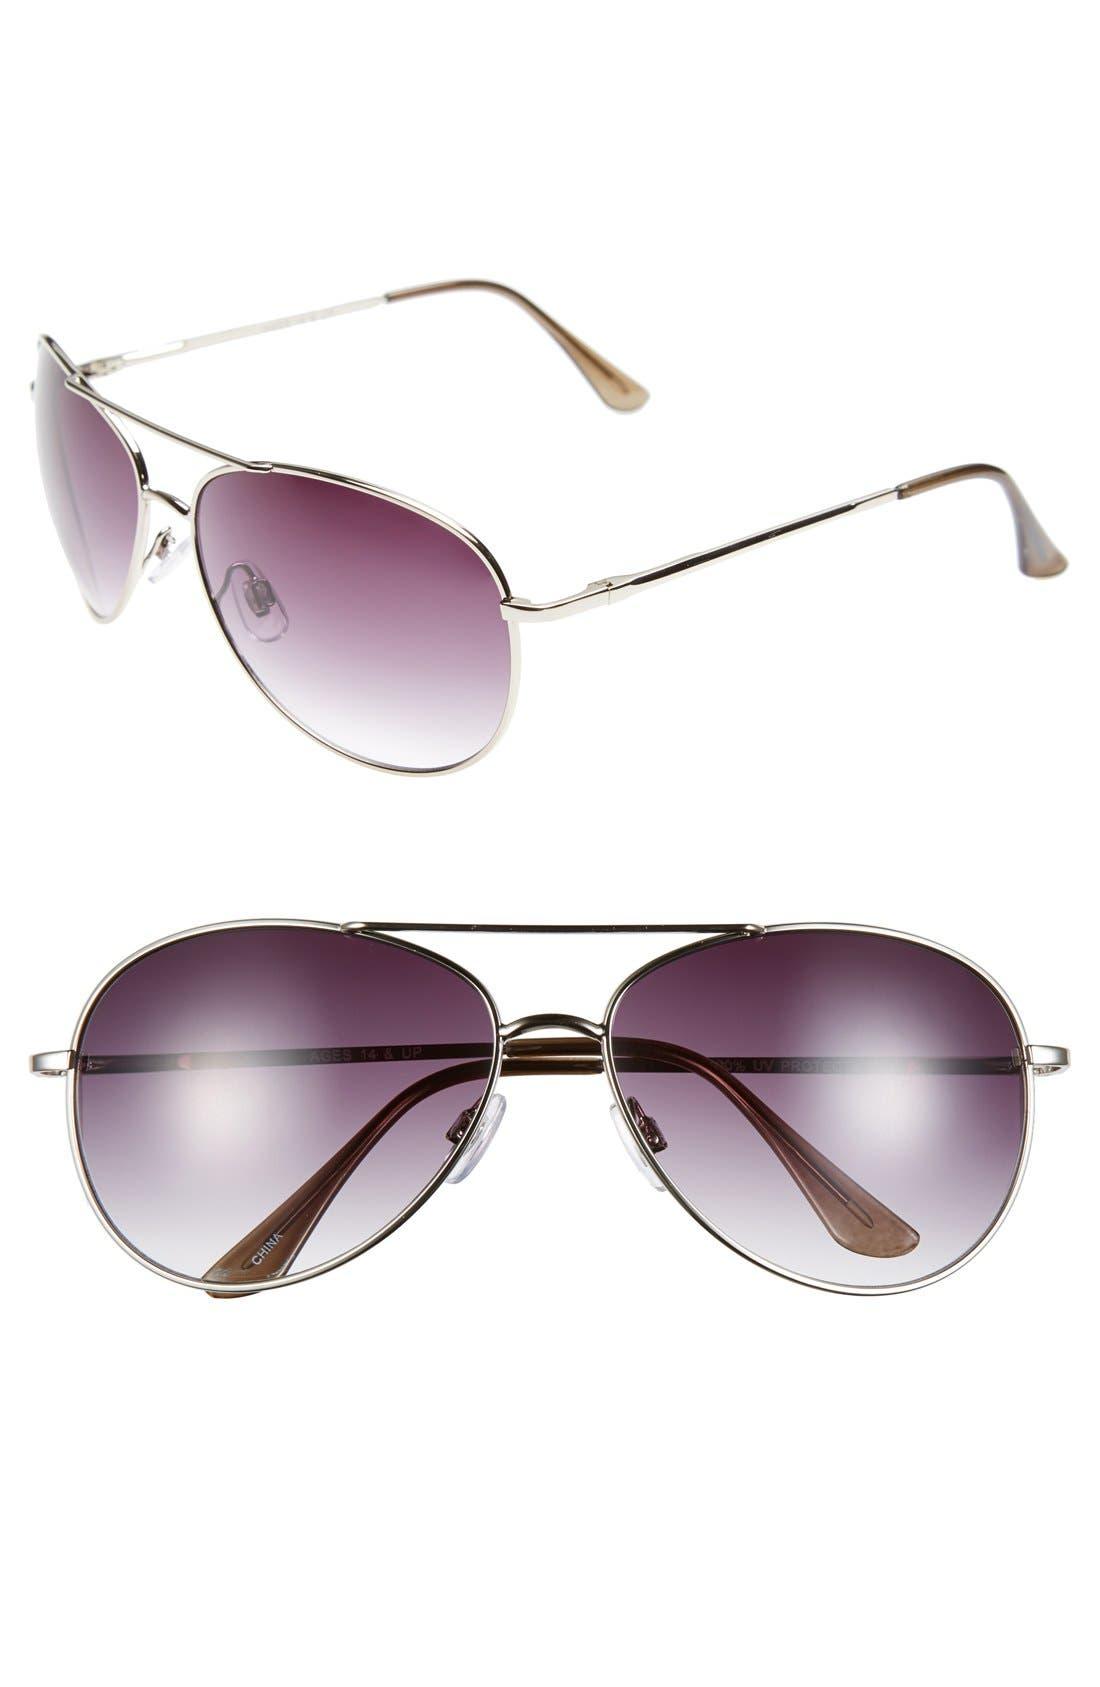 FANTASEYES, Fantas Eyes Aviator 60mm Sunglasses, Main thumbnail 1, color, 040